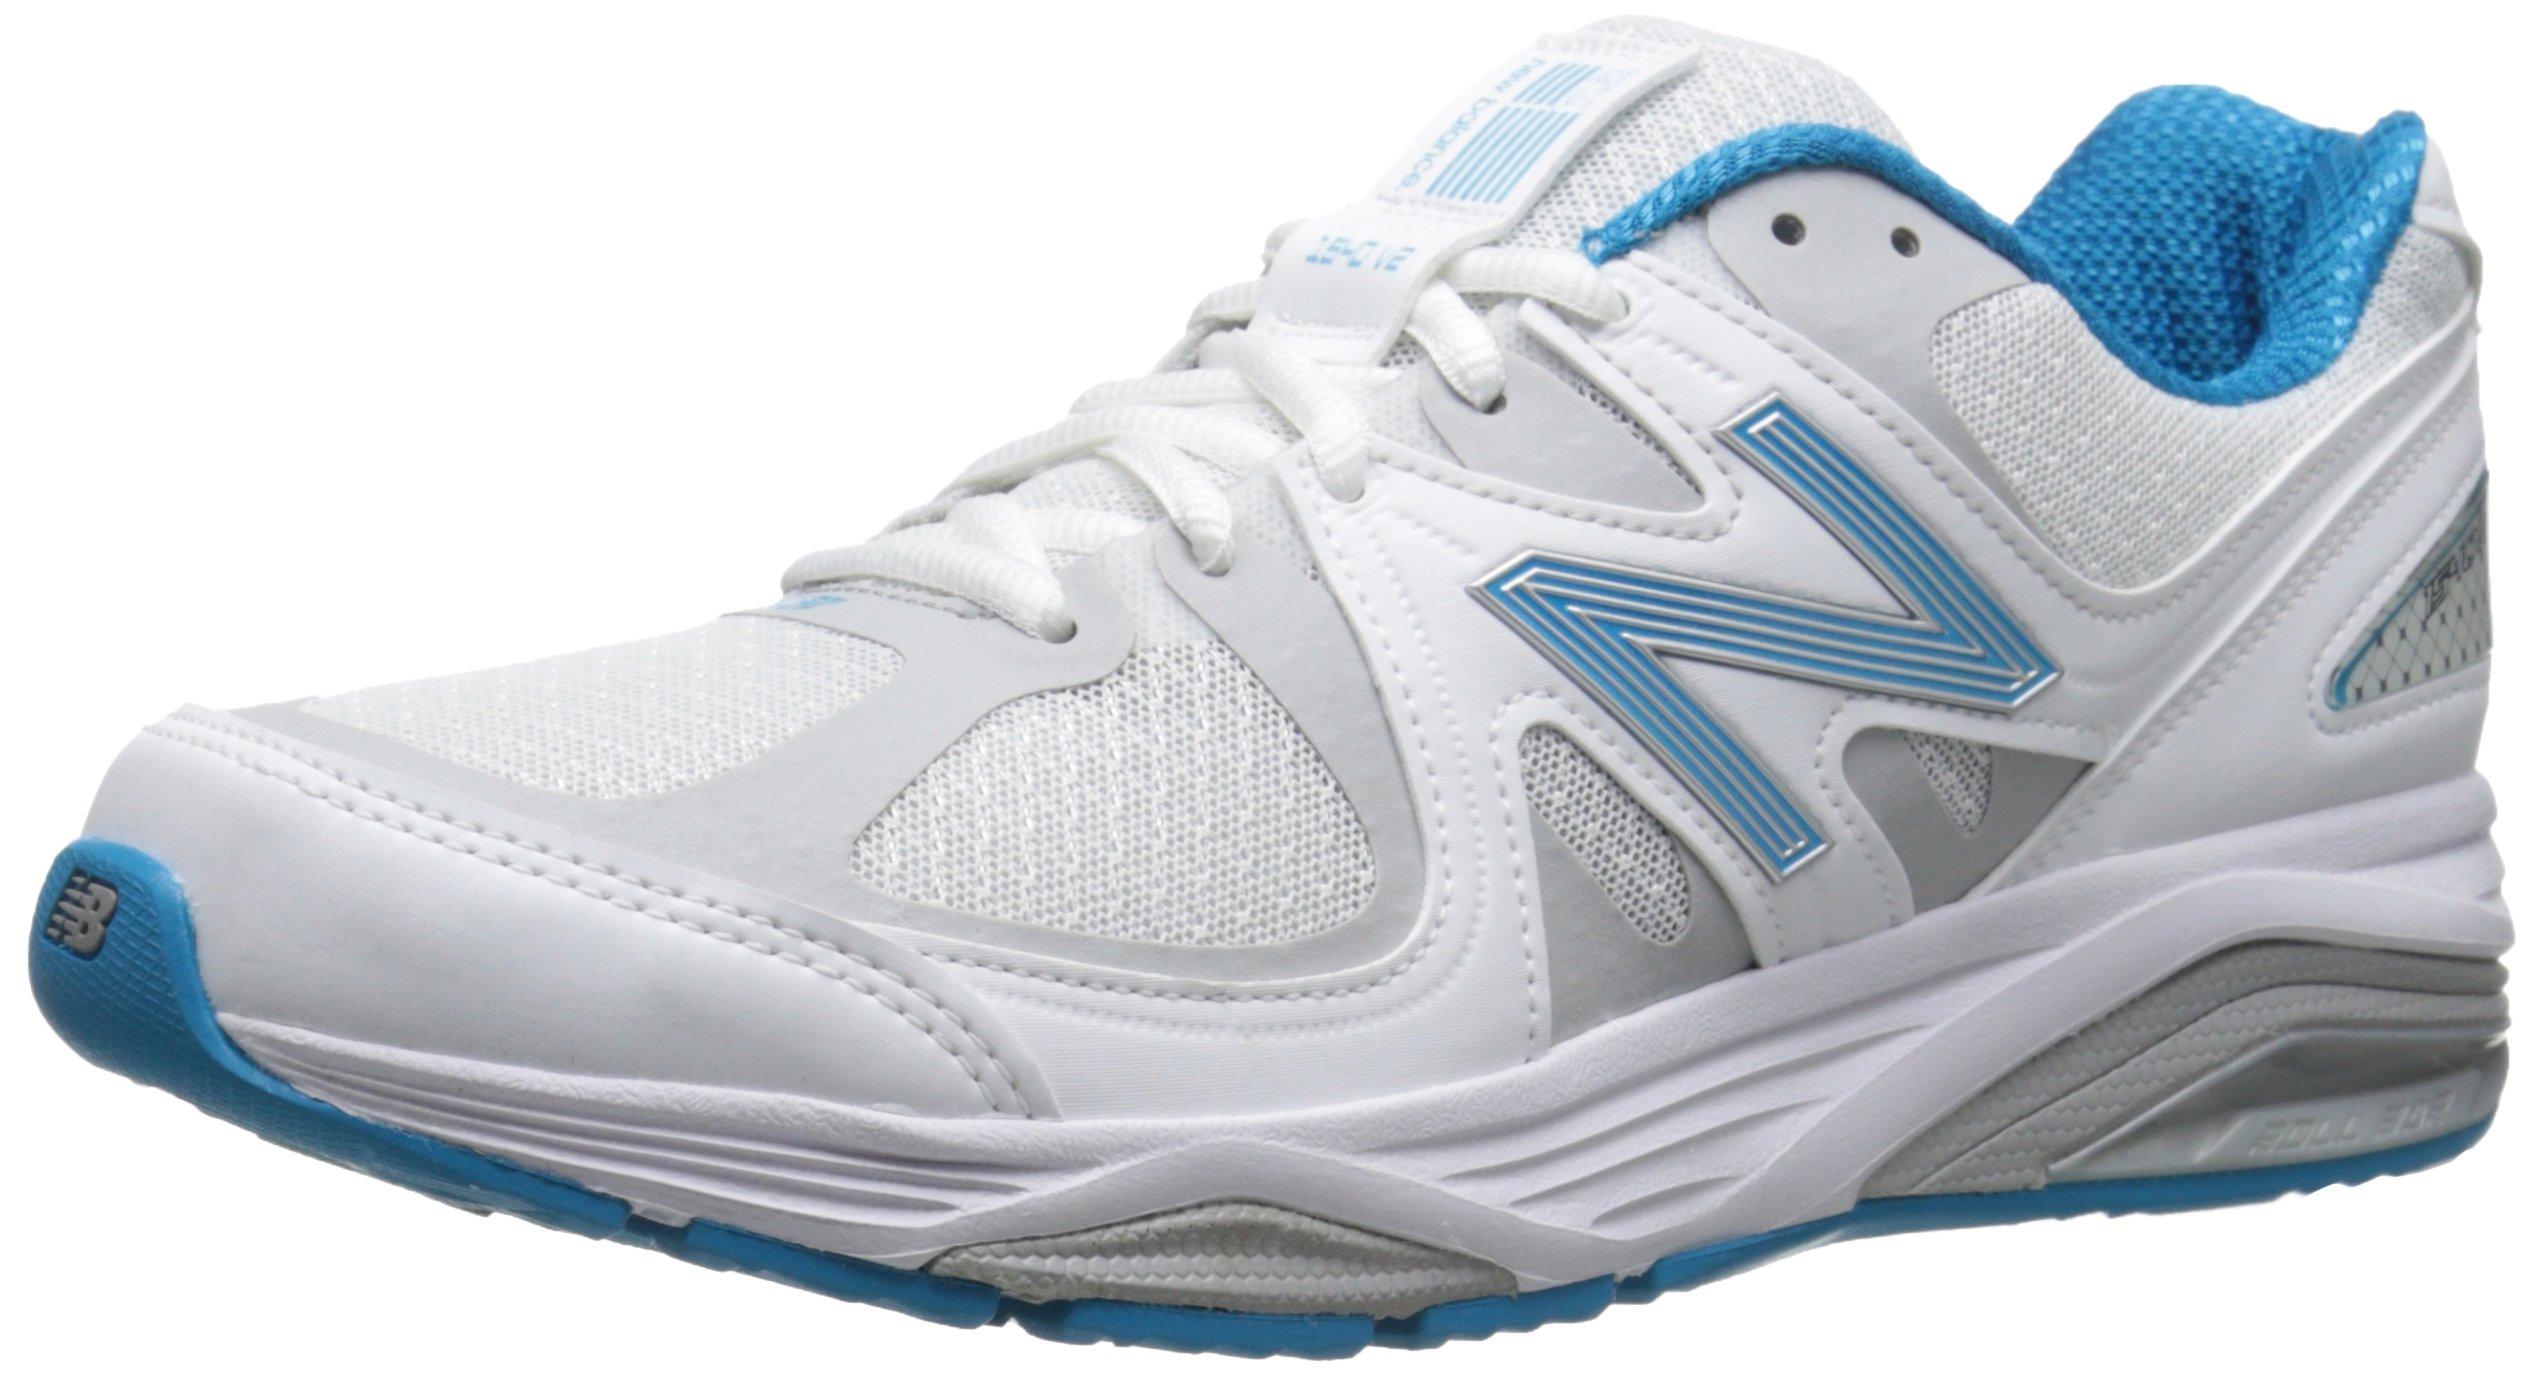 New Balance Women's W1540V2 Running Shoe, White/Blue, 11 B US